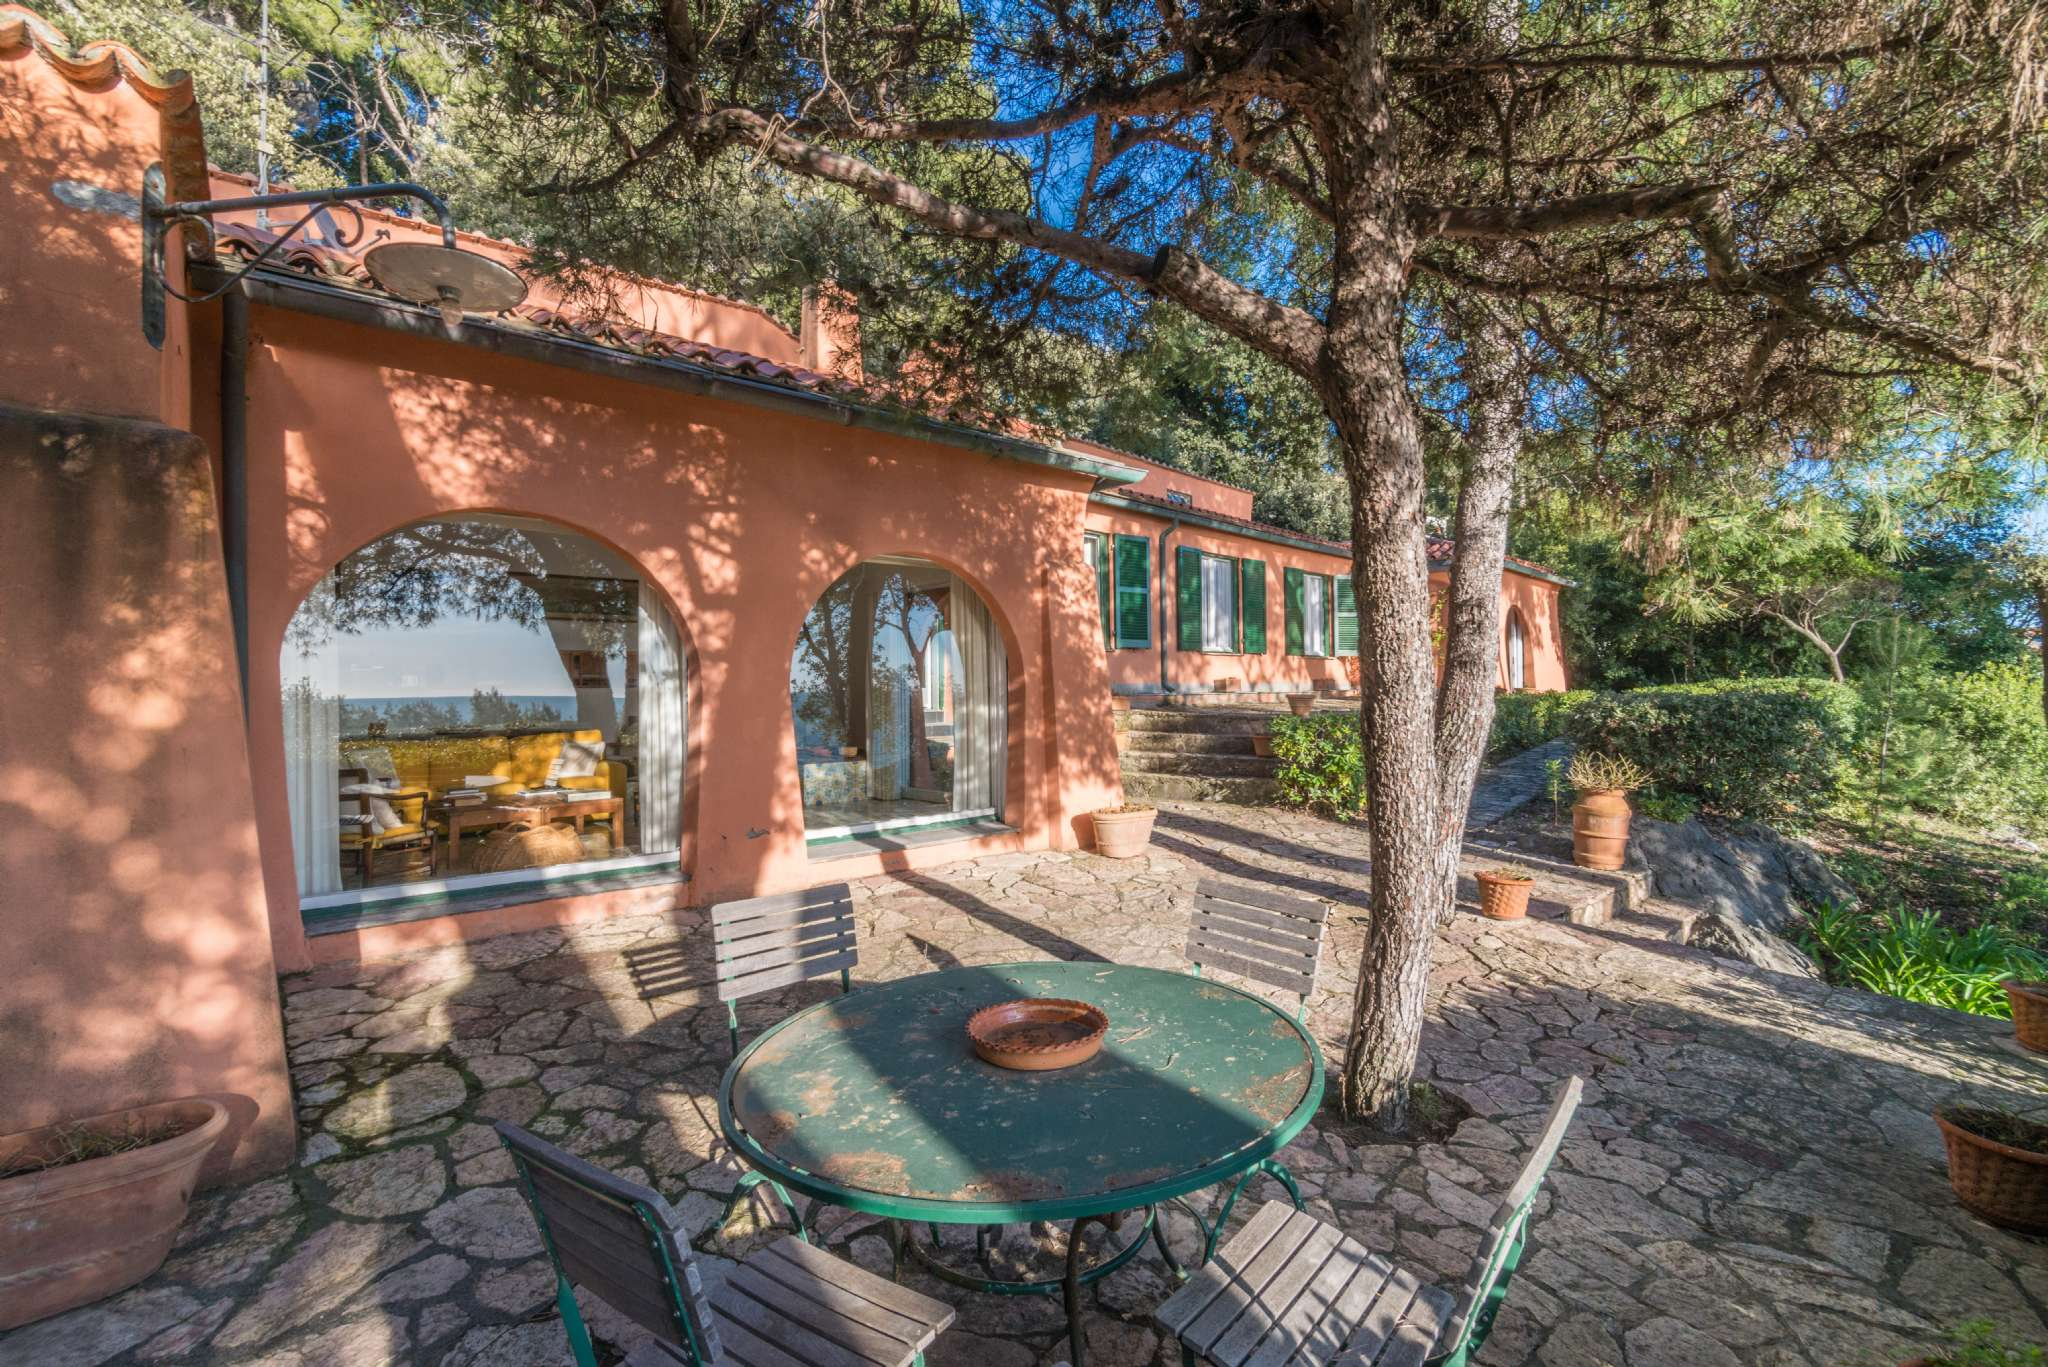 Villa in Vendita a Lerici: 5 locali, 340 mq - Foto 7